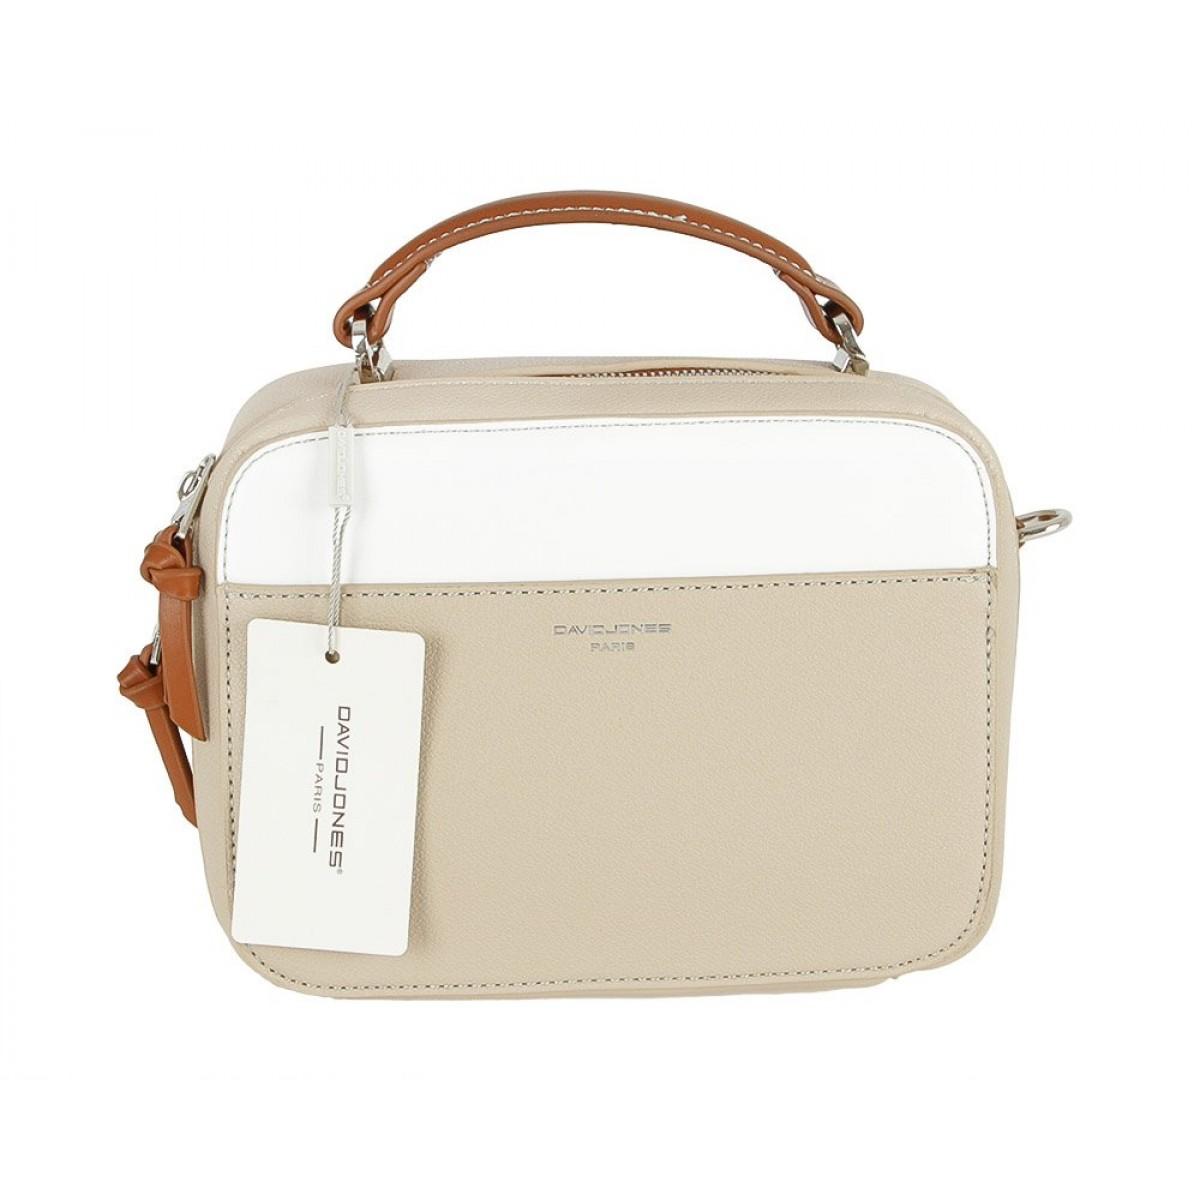 Жіноча сумка David Jones 5916-2 L.CAMEL